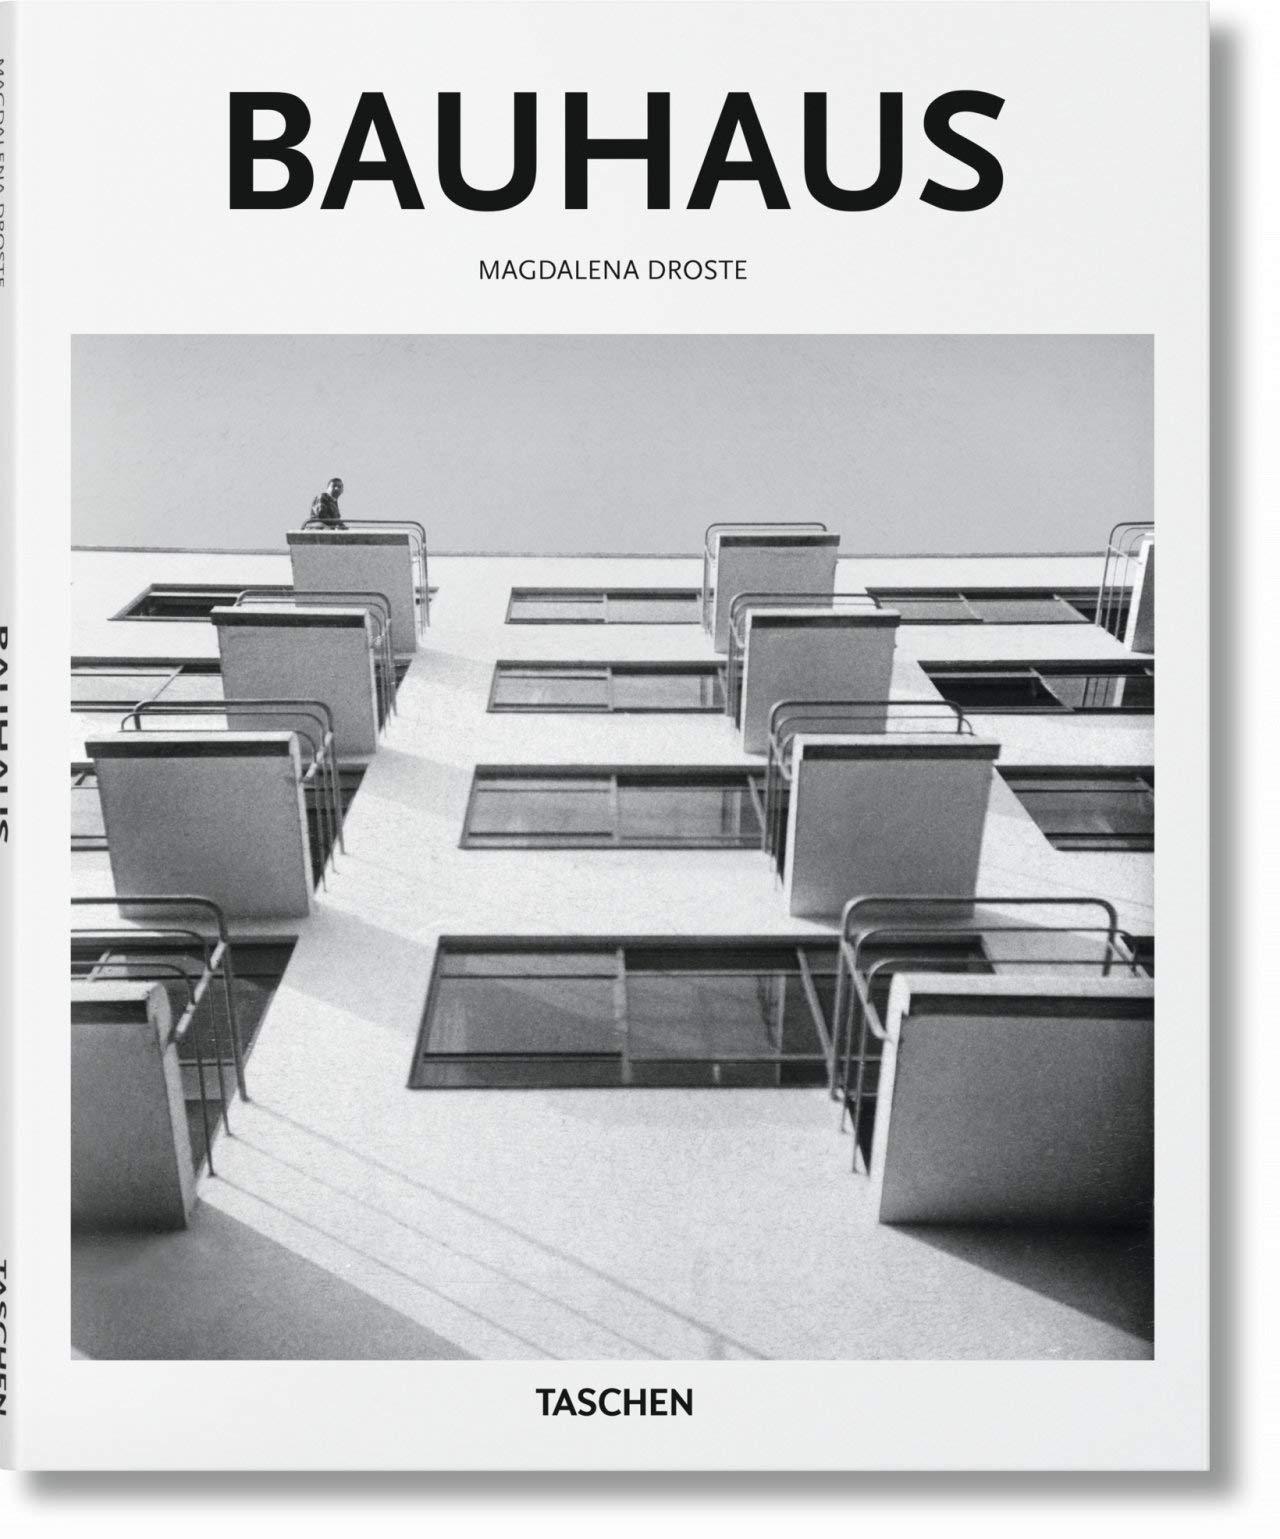 Bauhaus Coffee Table Book - $13.22